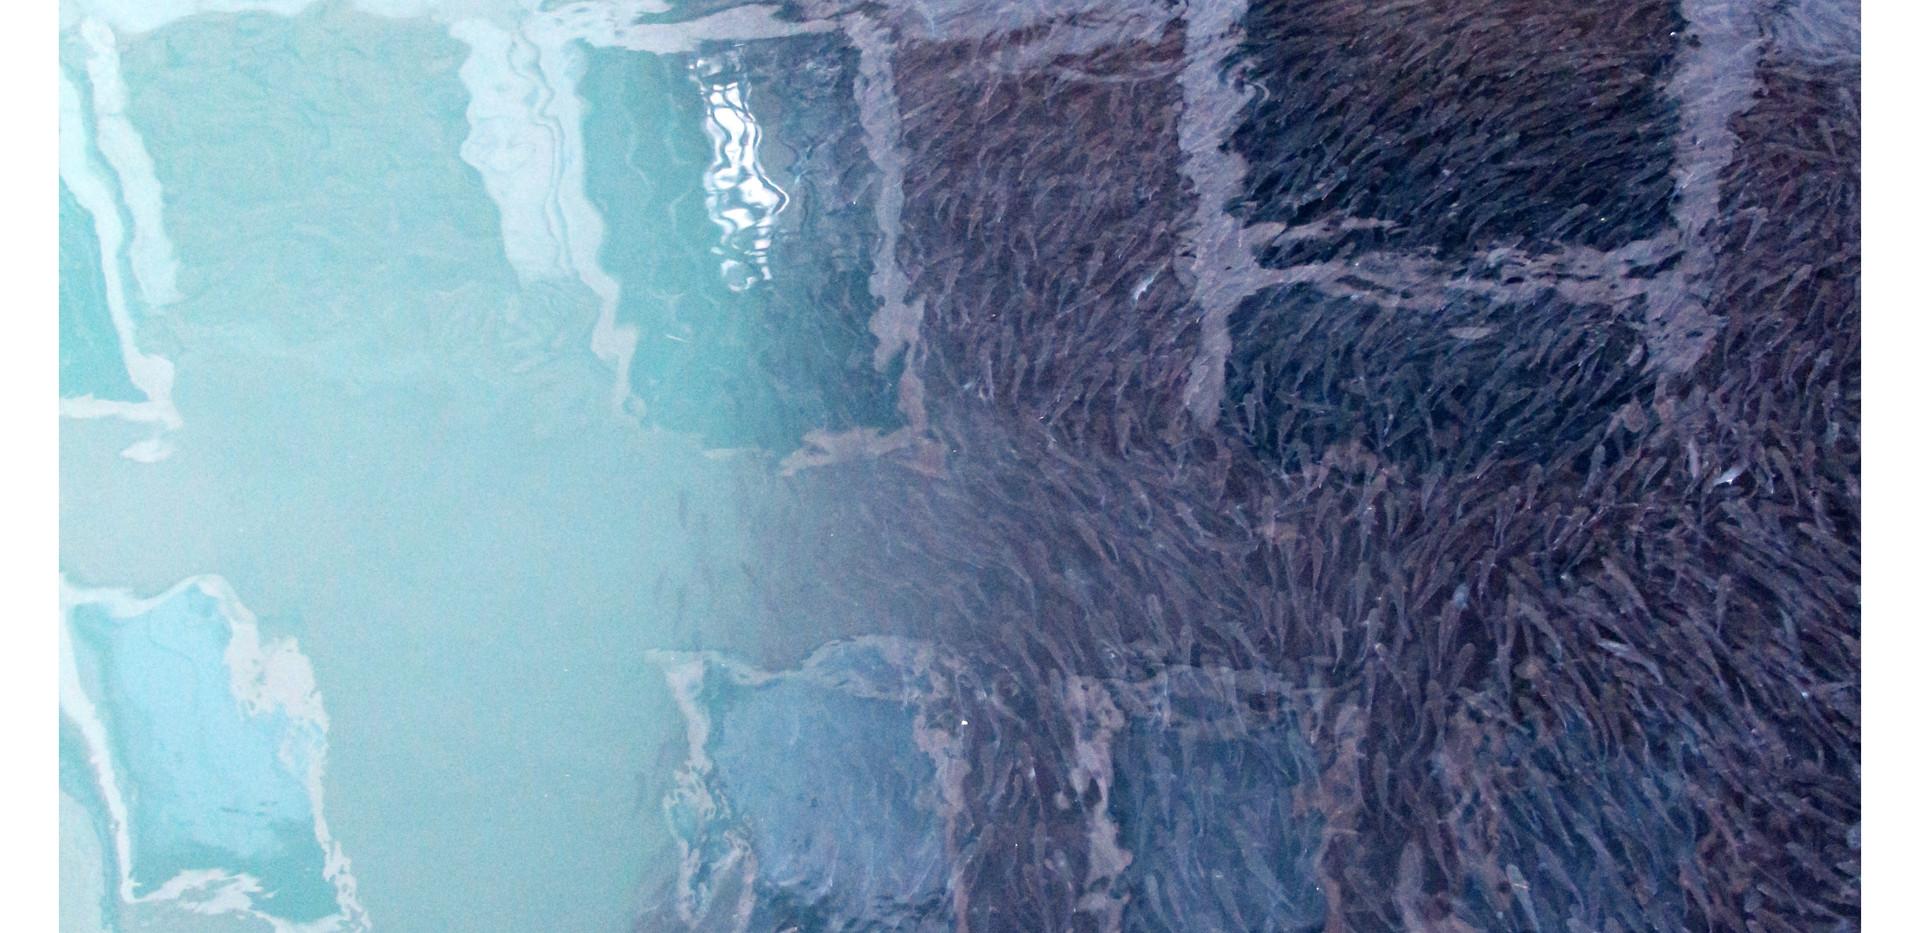 Cormorant's Paradise, New Venezia by Alexandre Cosentino Dec 2020